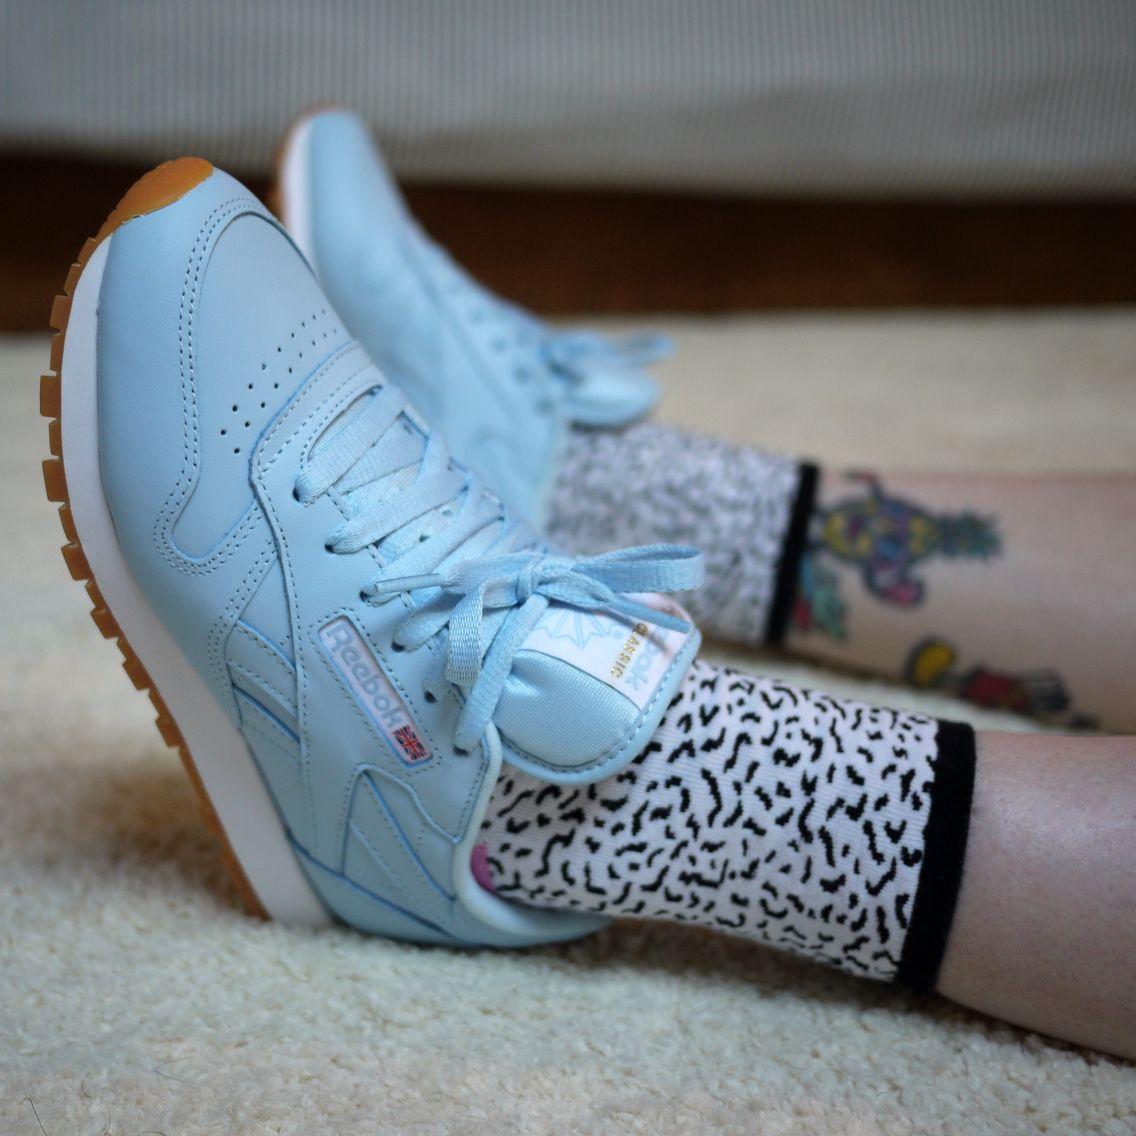 Suministro Reembolso oriental  Baby blue Reebok Classics with gum soles | Reebok classic, Reebok classic  sneakers, Sneakers blue